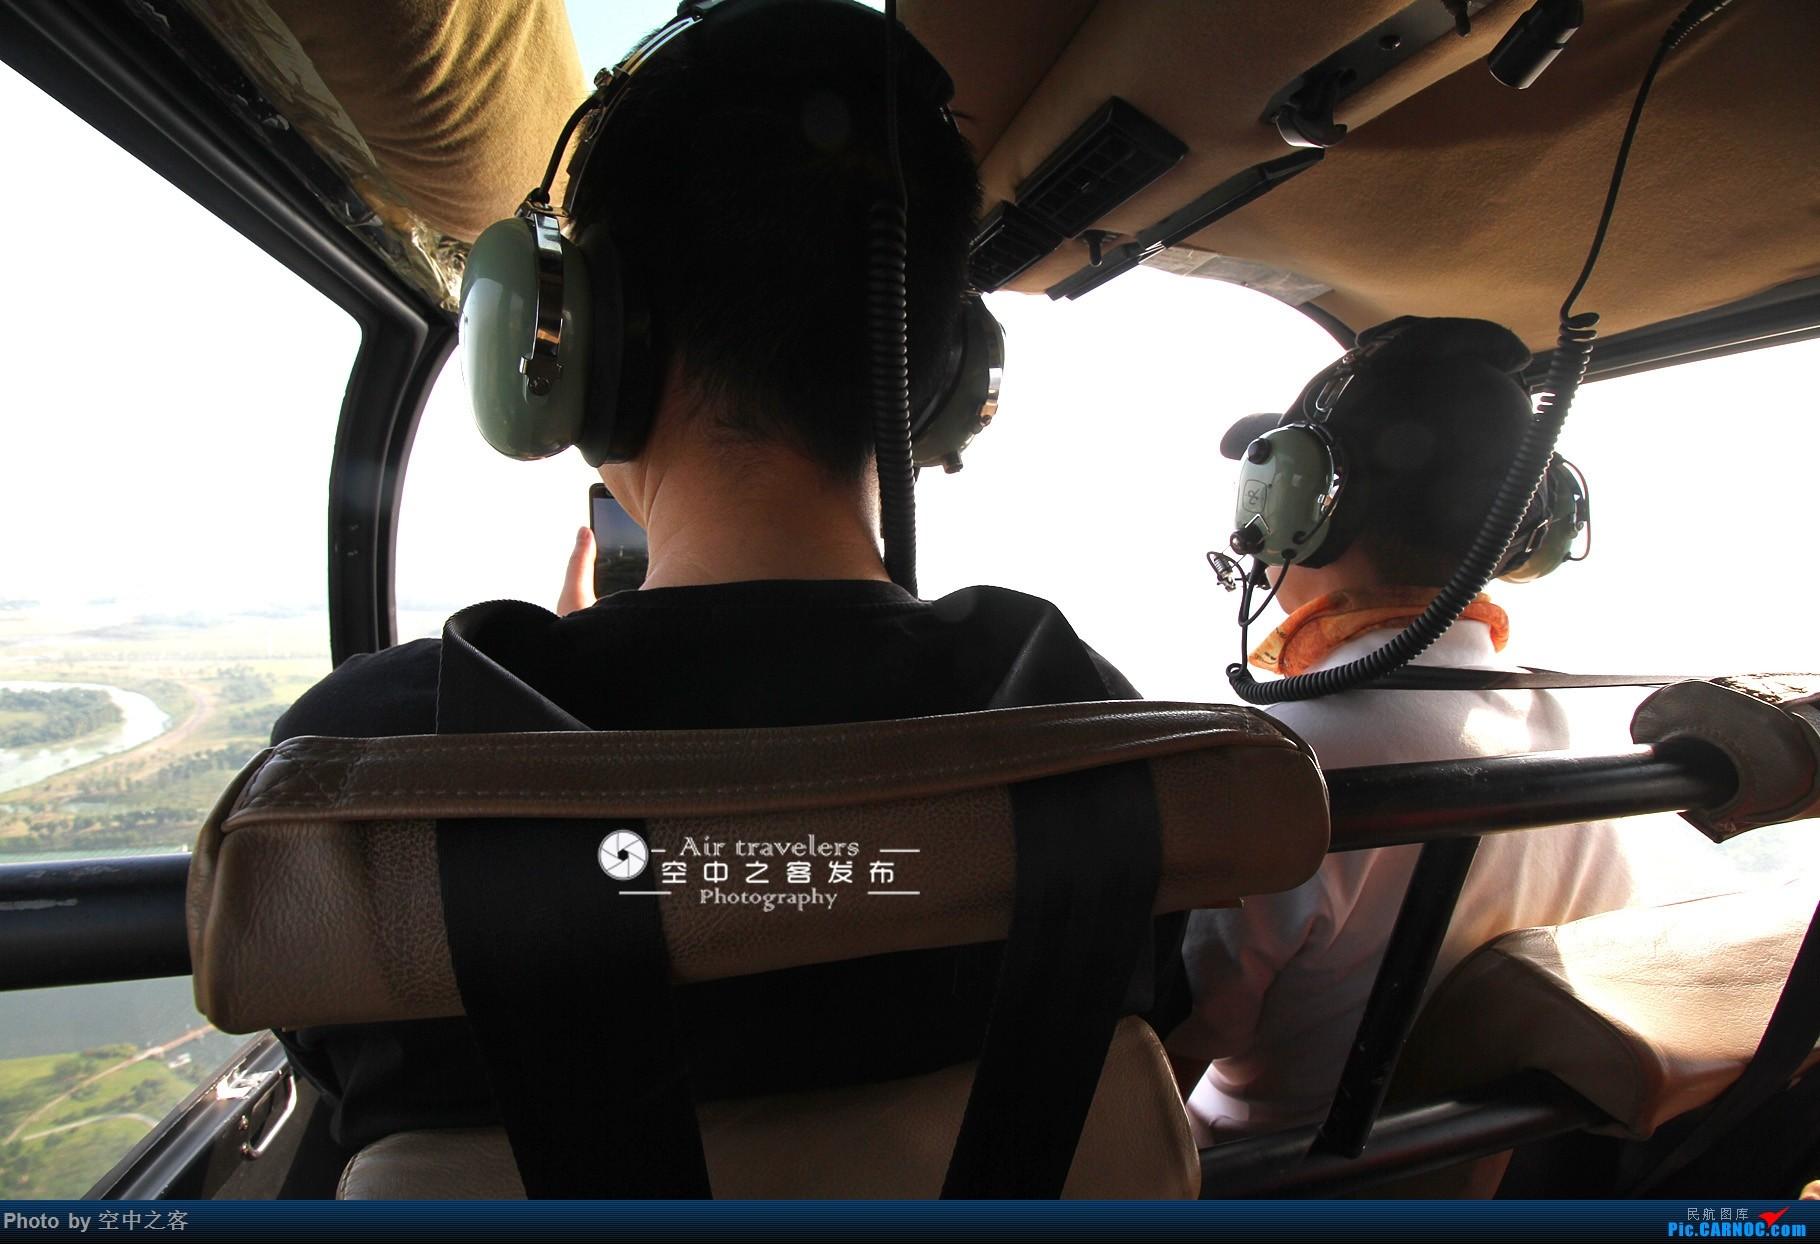 Re:[原创][空中之客发布]与aiolia7456大佬体验顶宏通航R-44滨湖之旅 ROBINSON R44 II B-7261 合肥滨湖上空